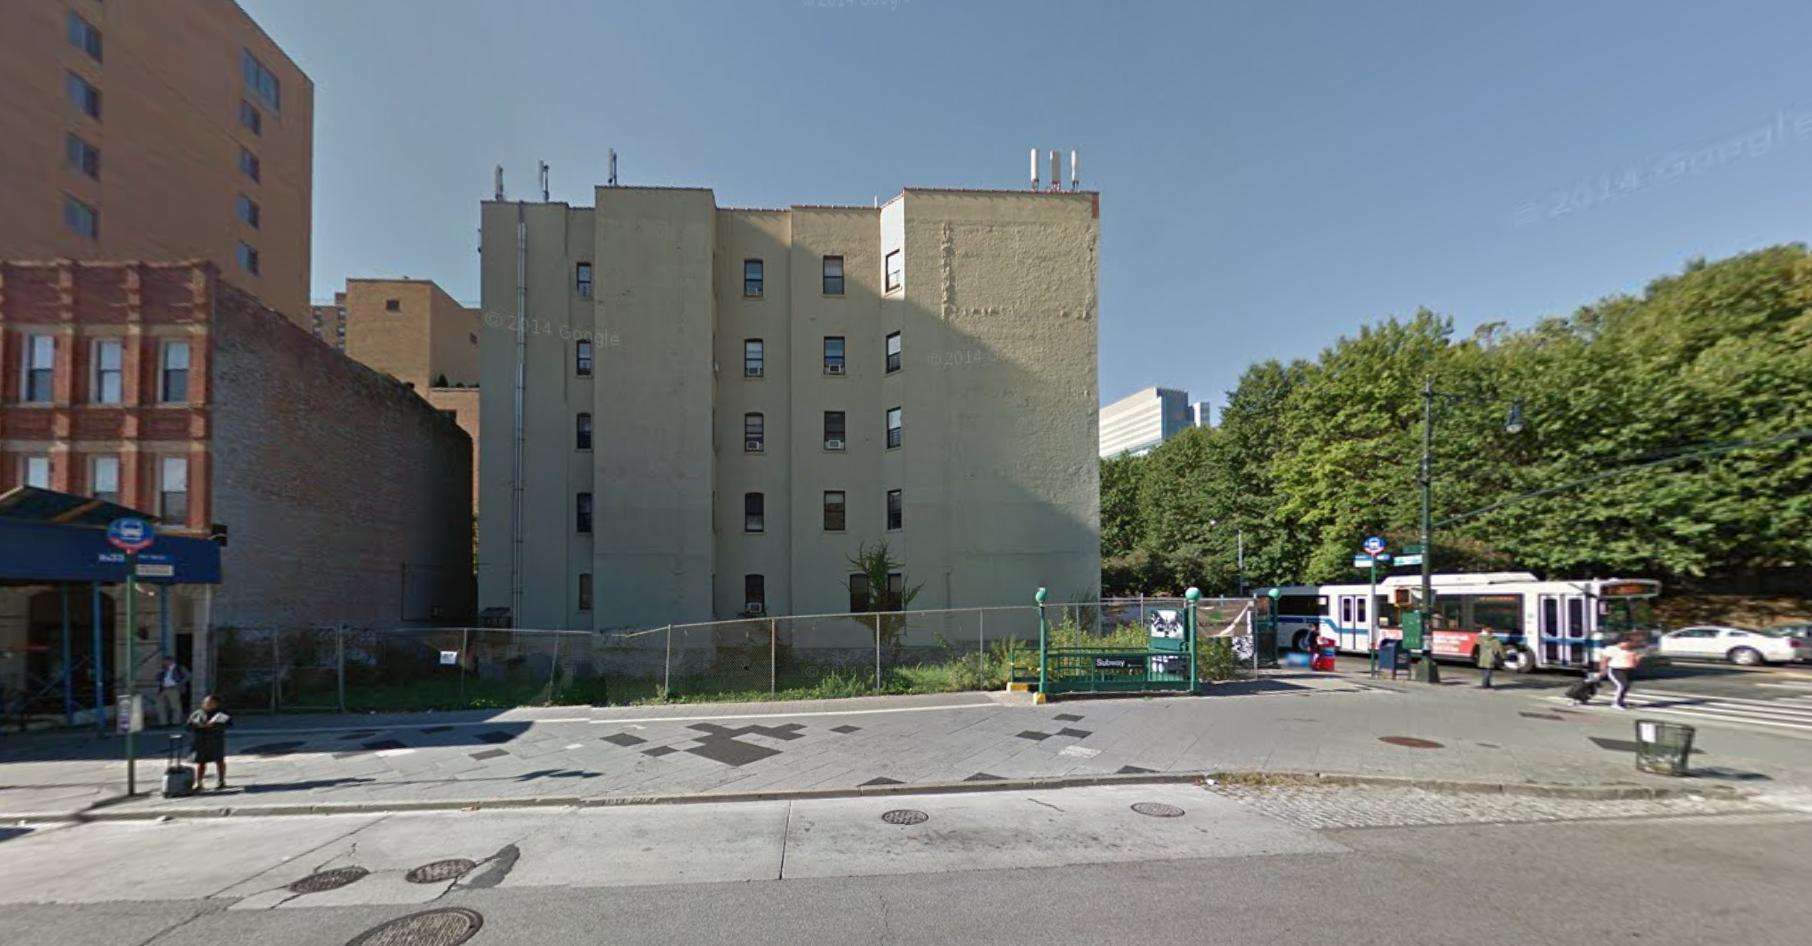 320 West 135th Street, image via Google Maps